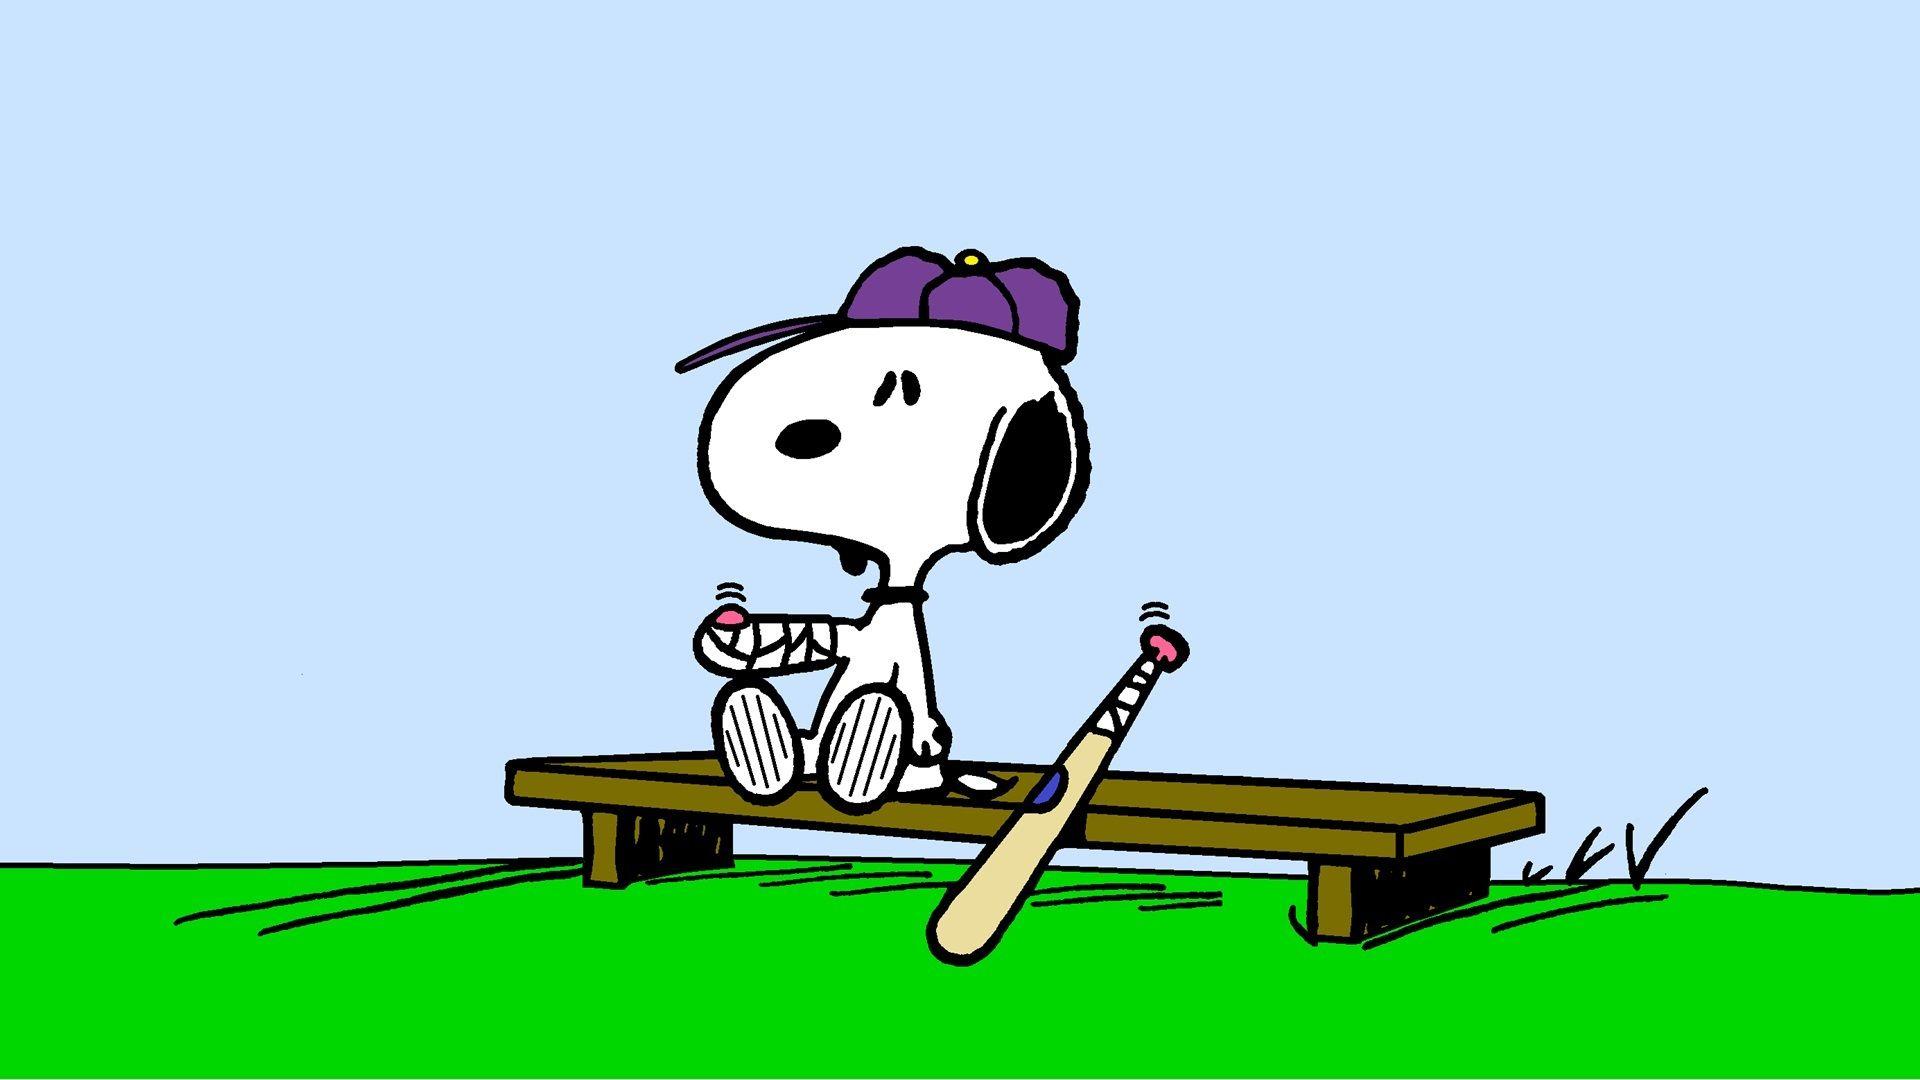 Snoopy Injured Baseball Player Wallpaper 1920x1080 Jpeg Snoopy Images Cartoon Wallpaper Snoopy